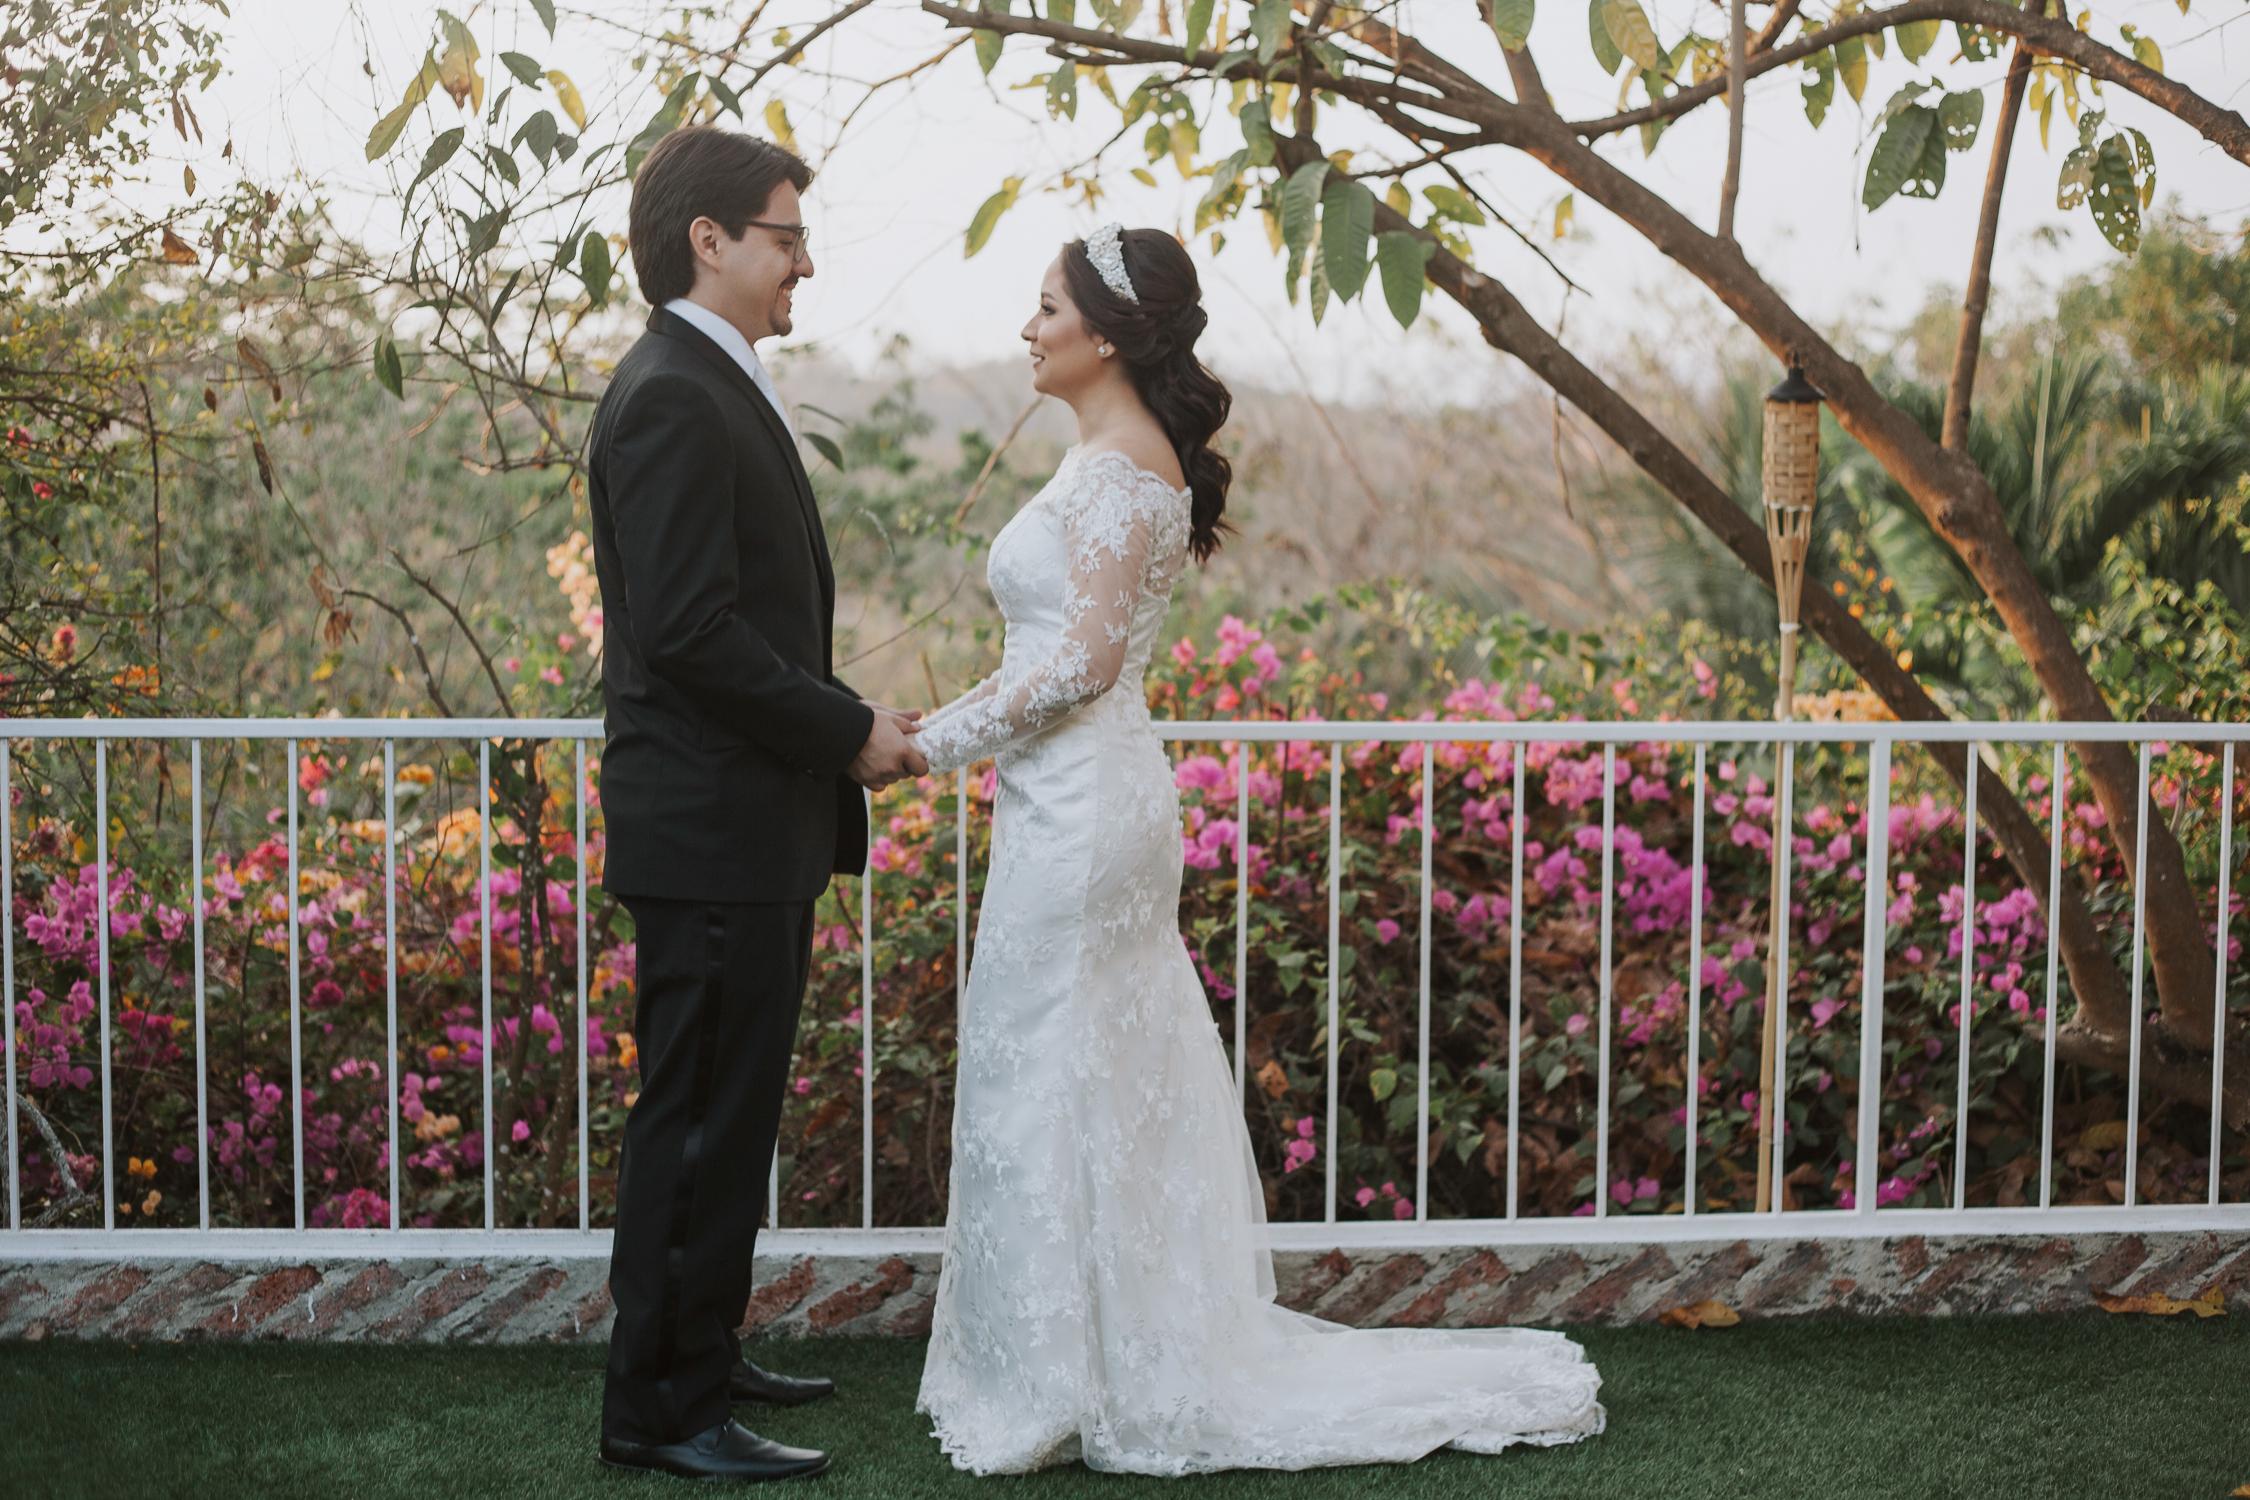 Michelle-Agurto-Fotografia-Bodas-Ecuador-Destination-Wedding-Photographer-Pauli-Edwin-15.JPG